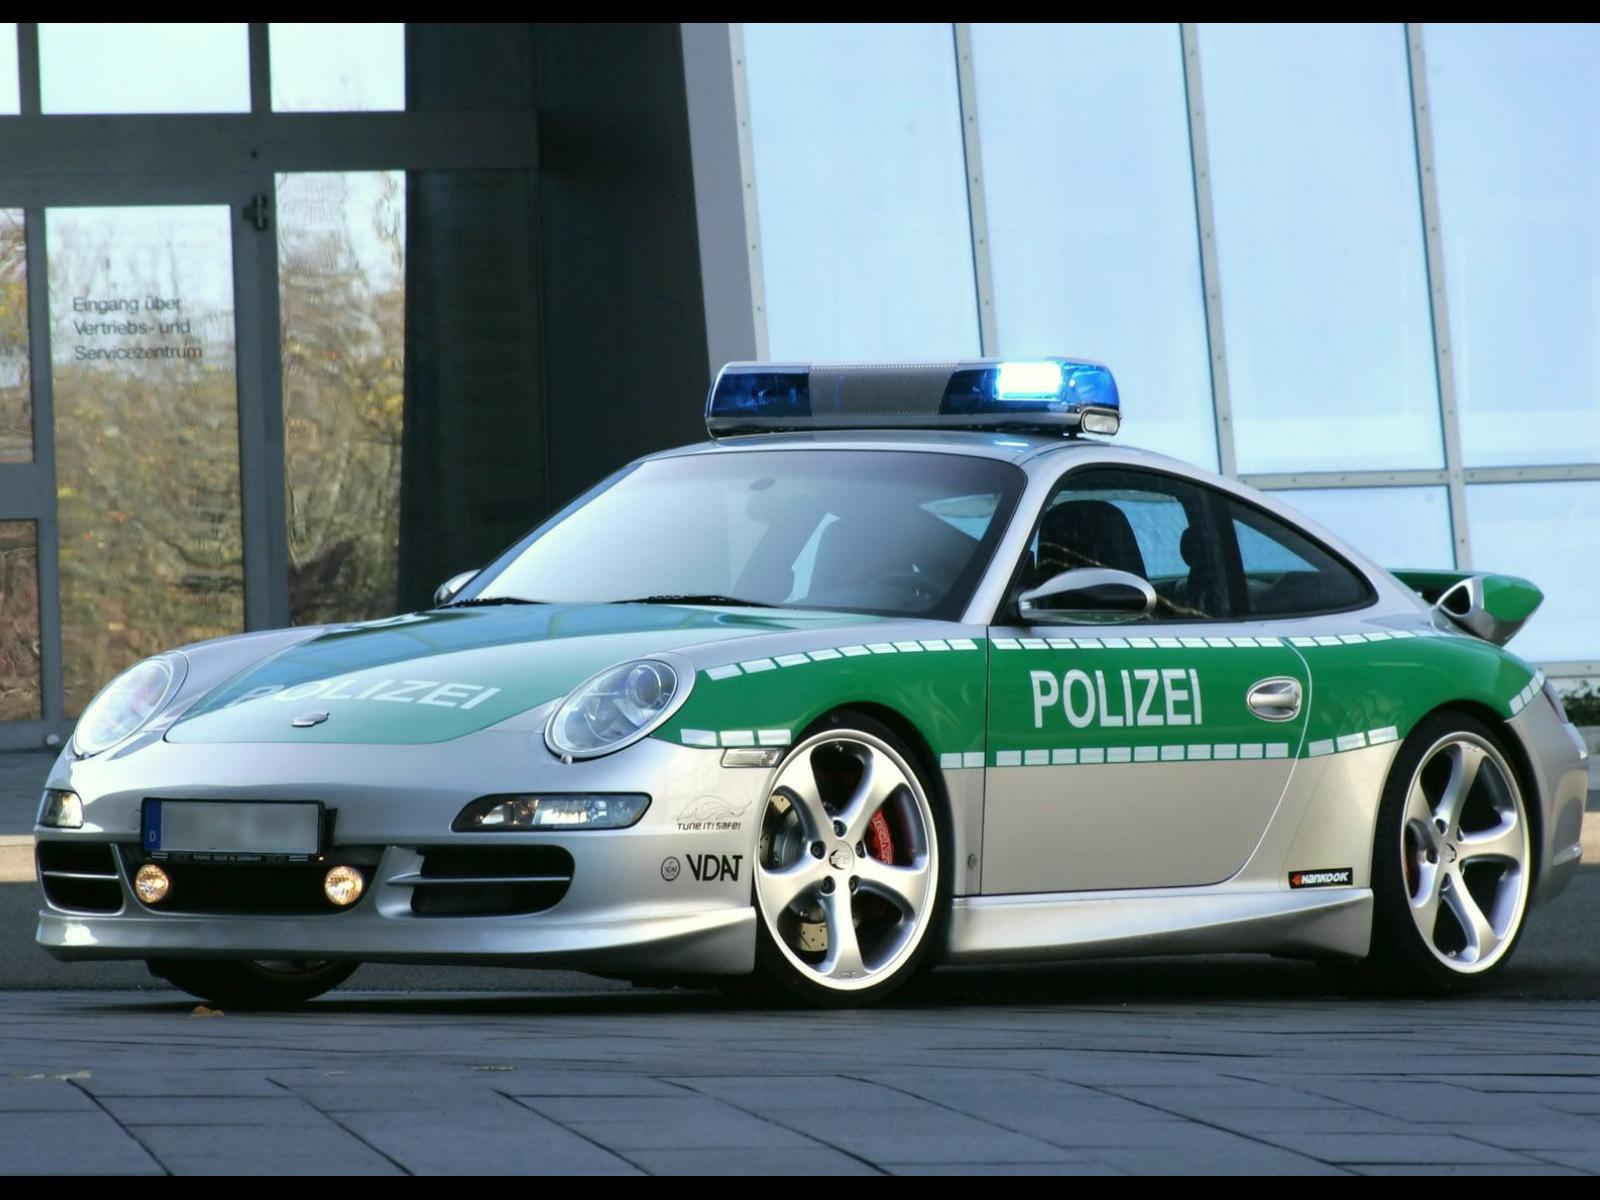 Cars Porsche Police Car Wallpaper | Free Images at Clker.com - vector ...